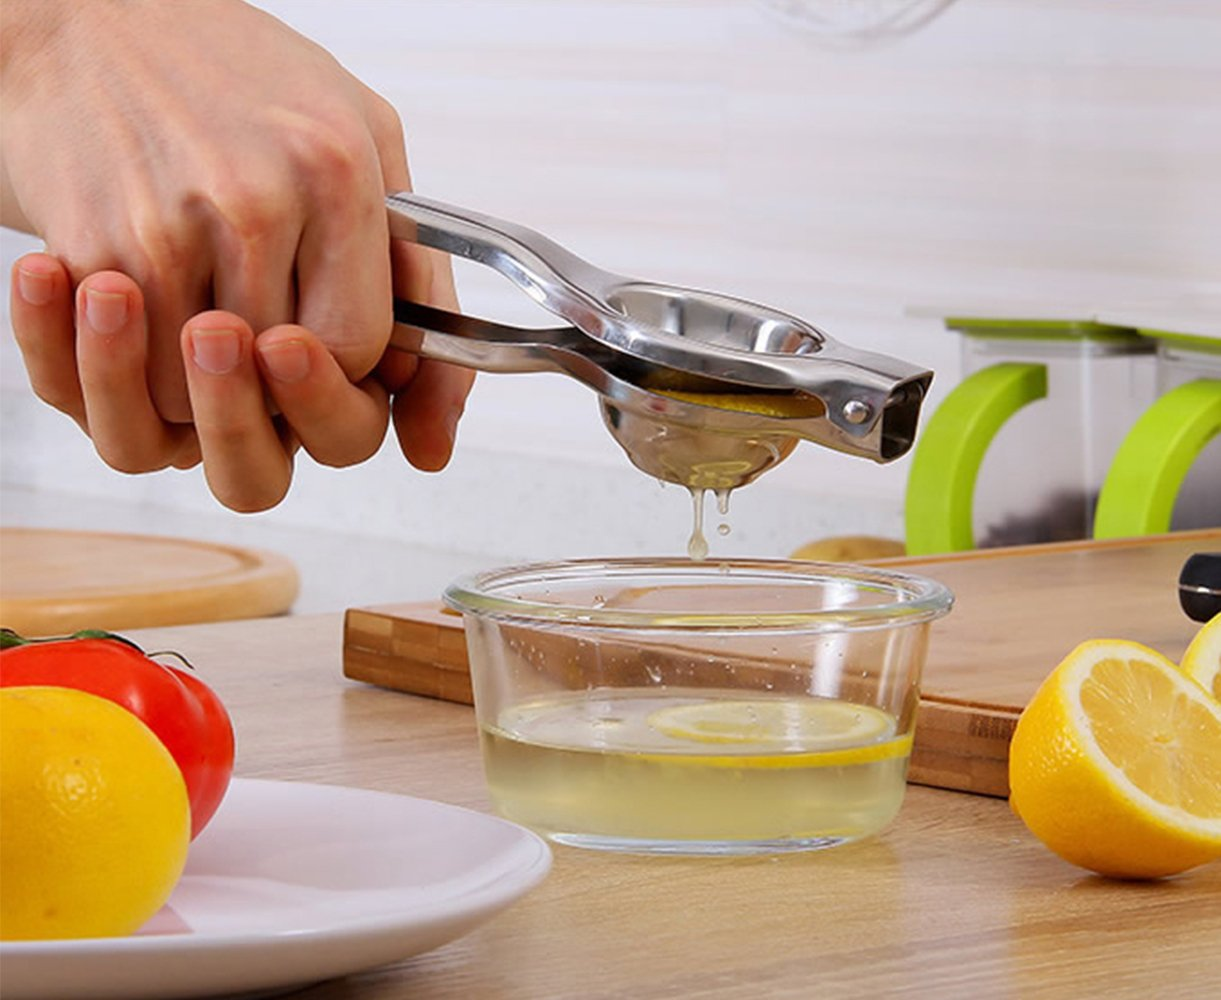 Kitchen Gadgets Gifts Utensil Set, Wine Opener+Lemon Squeezer+Peeler+Garlic Press-4 Piece Stainless Steel Kitchen Utensil Kit With Flannelette Bagsette Bags Kitchen Utensil Set